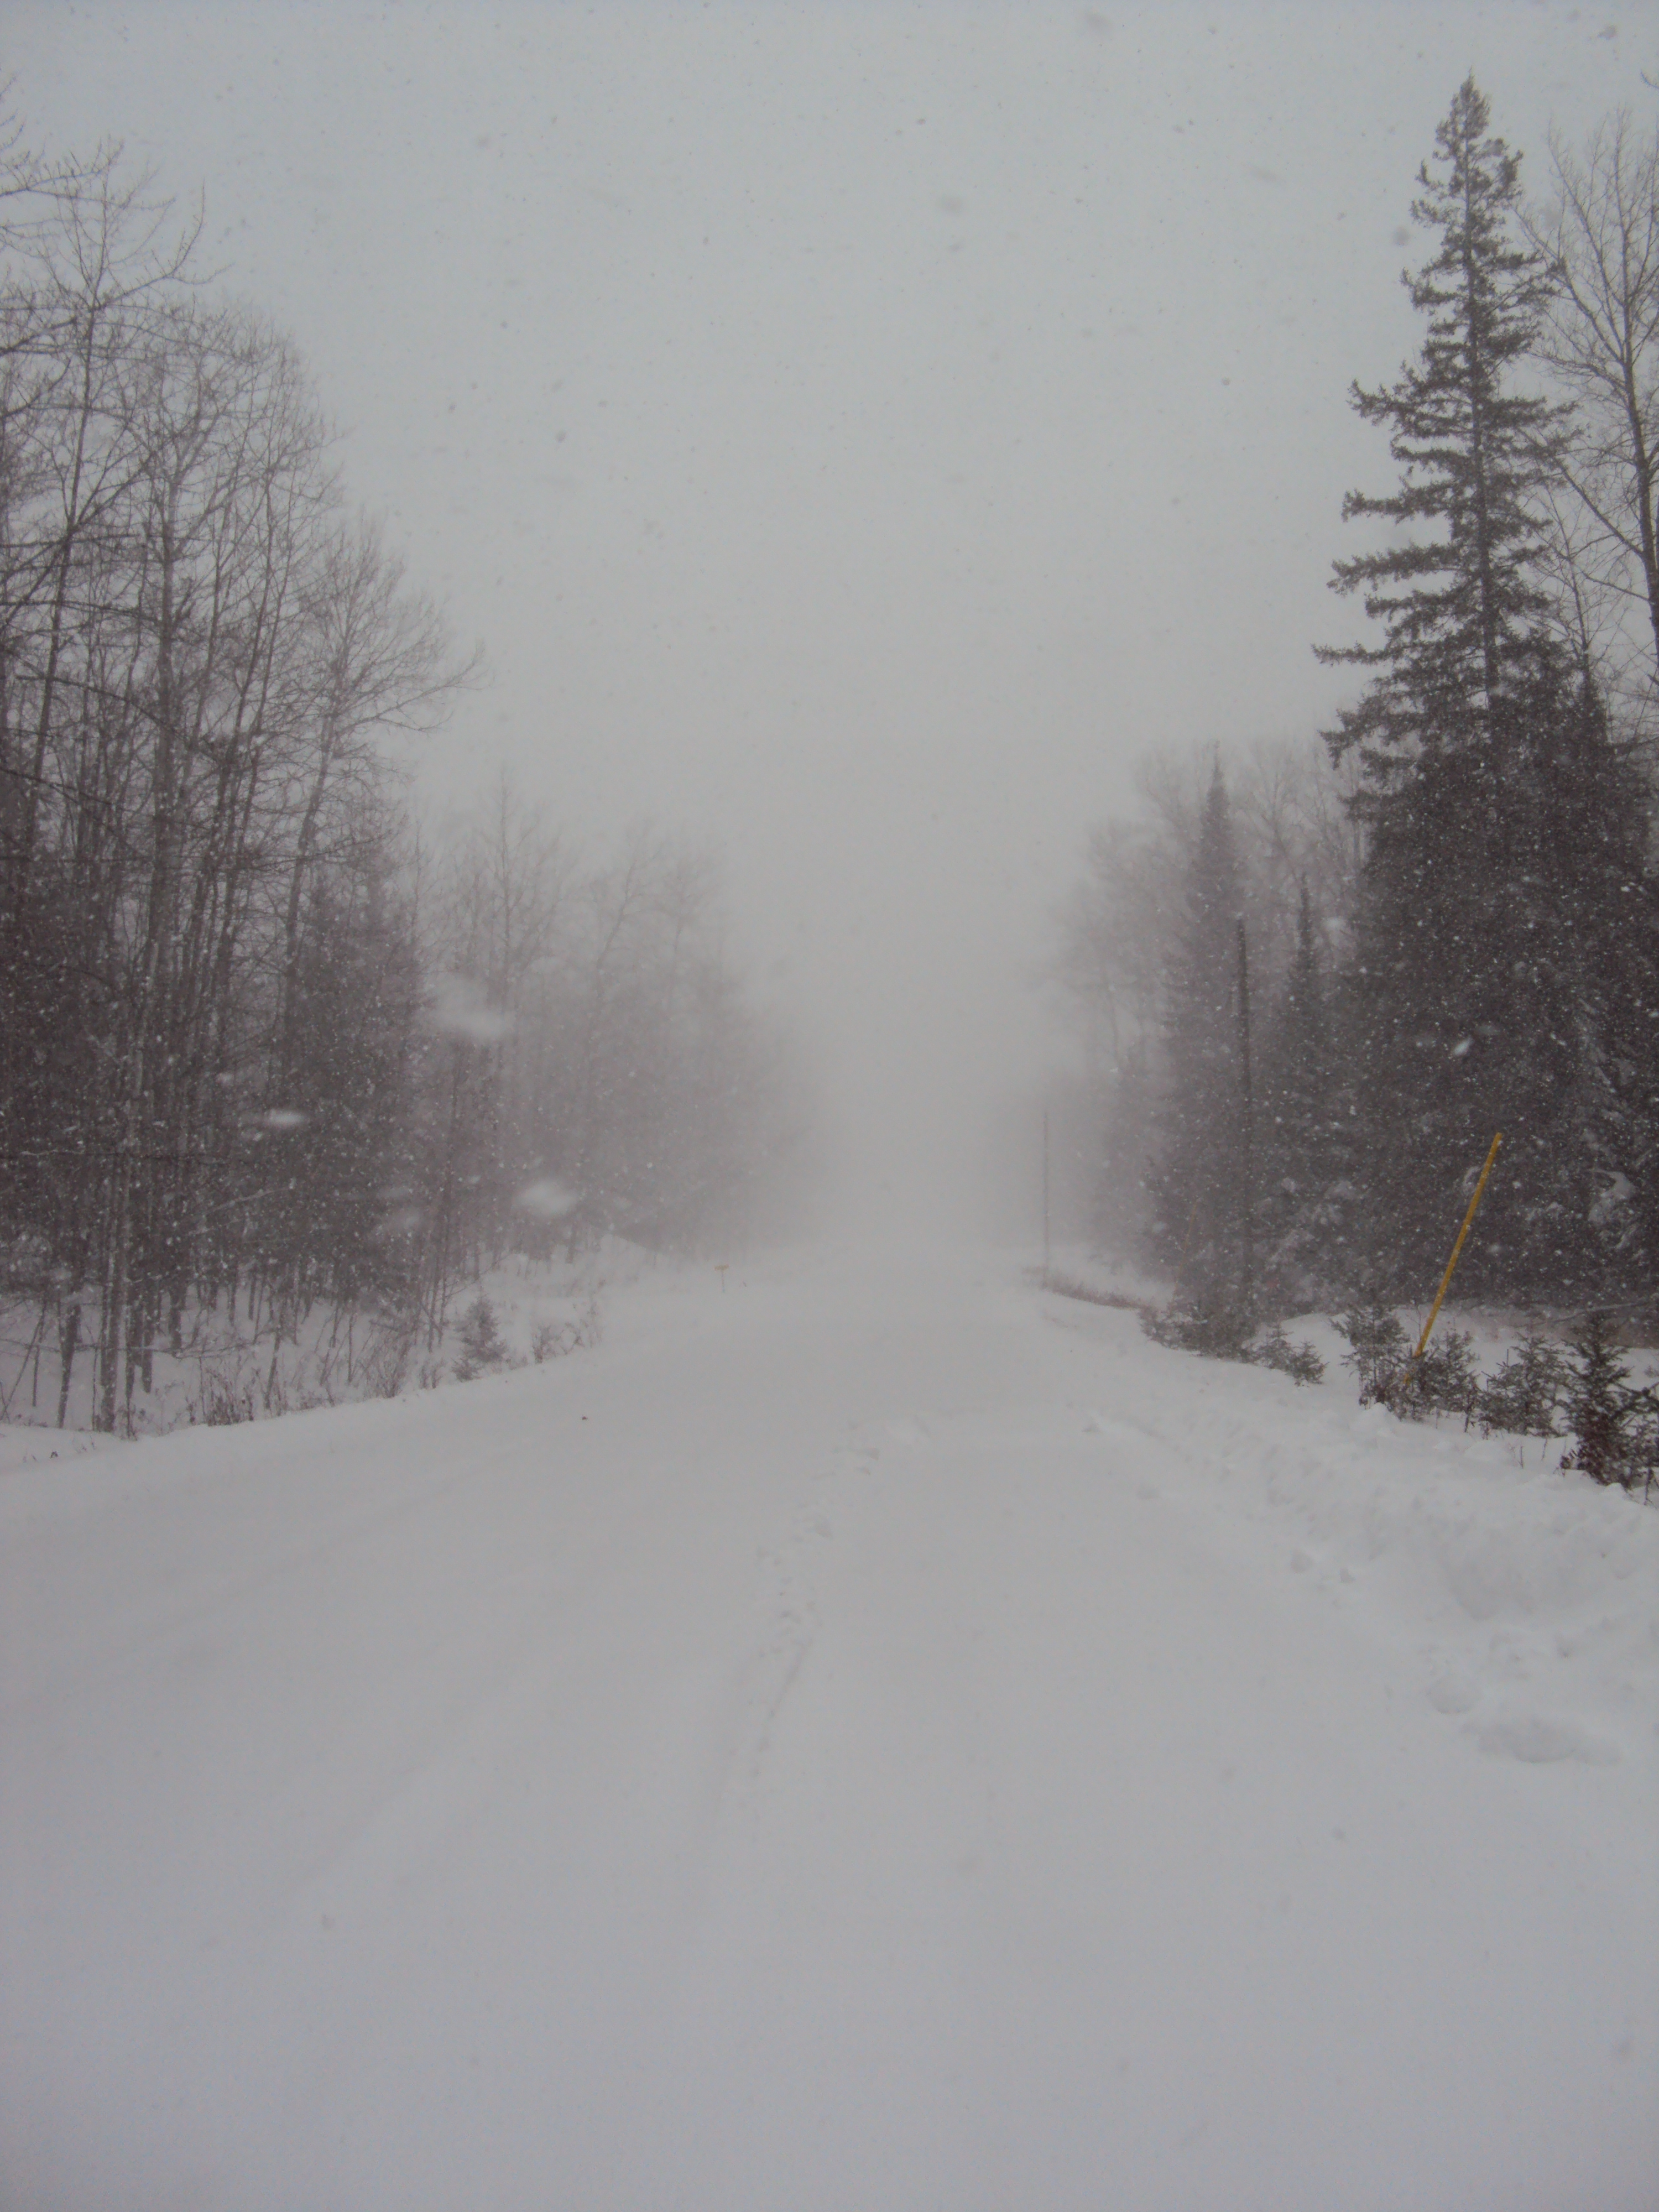 Blizzard!!   Opening the door, walking outside